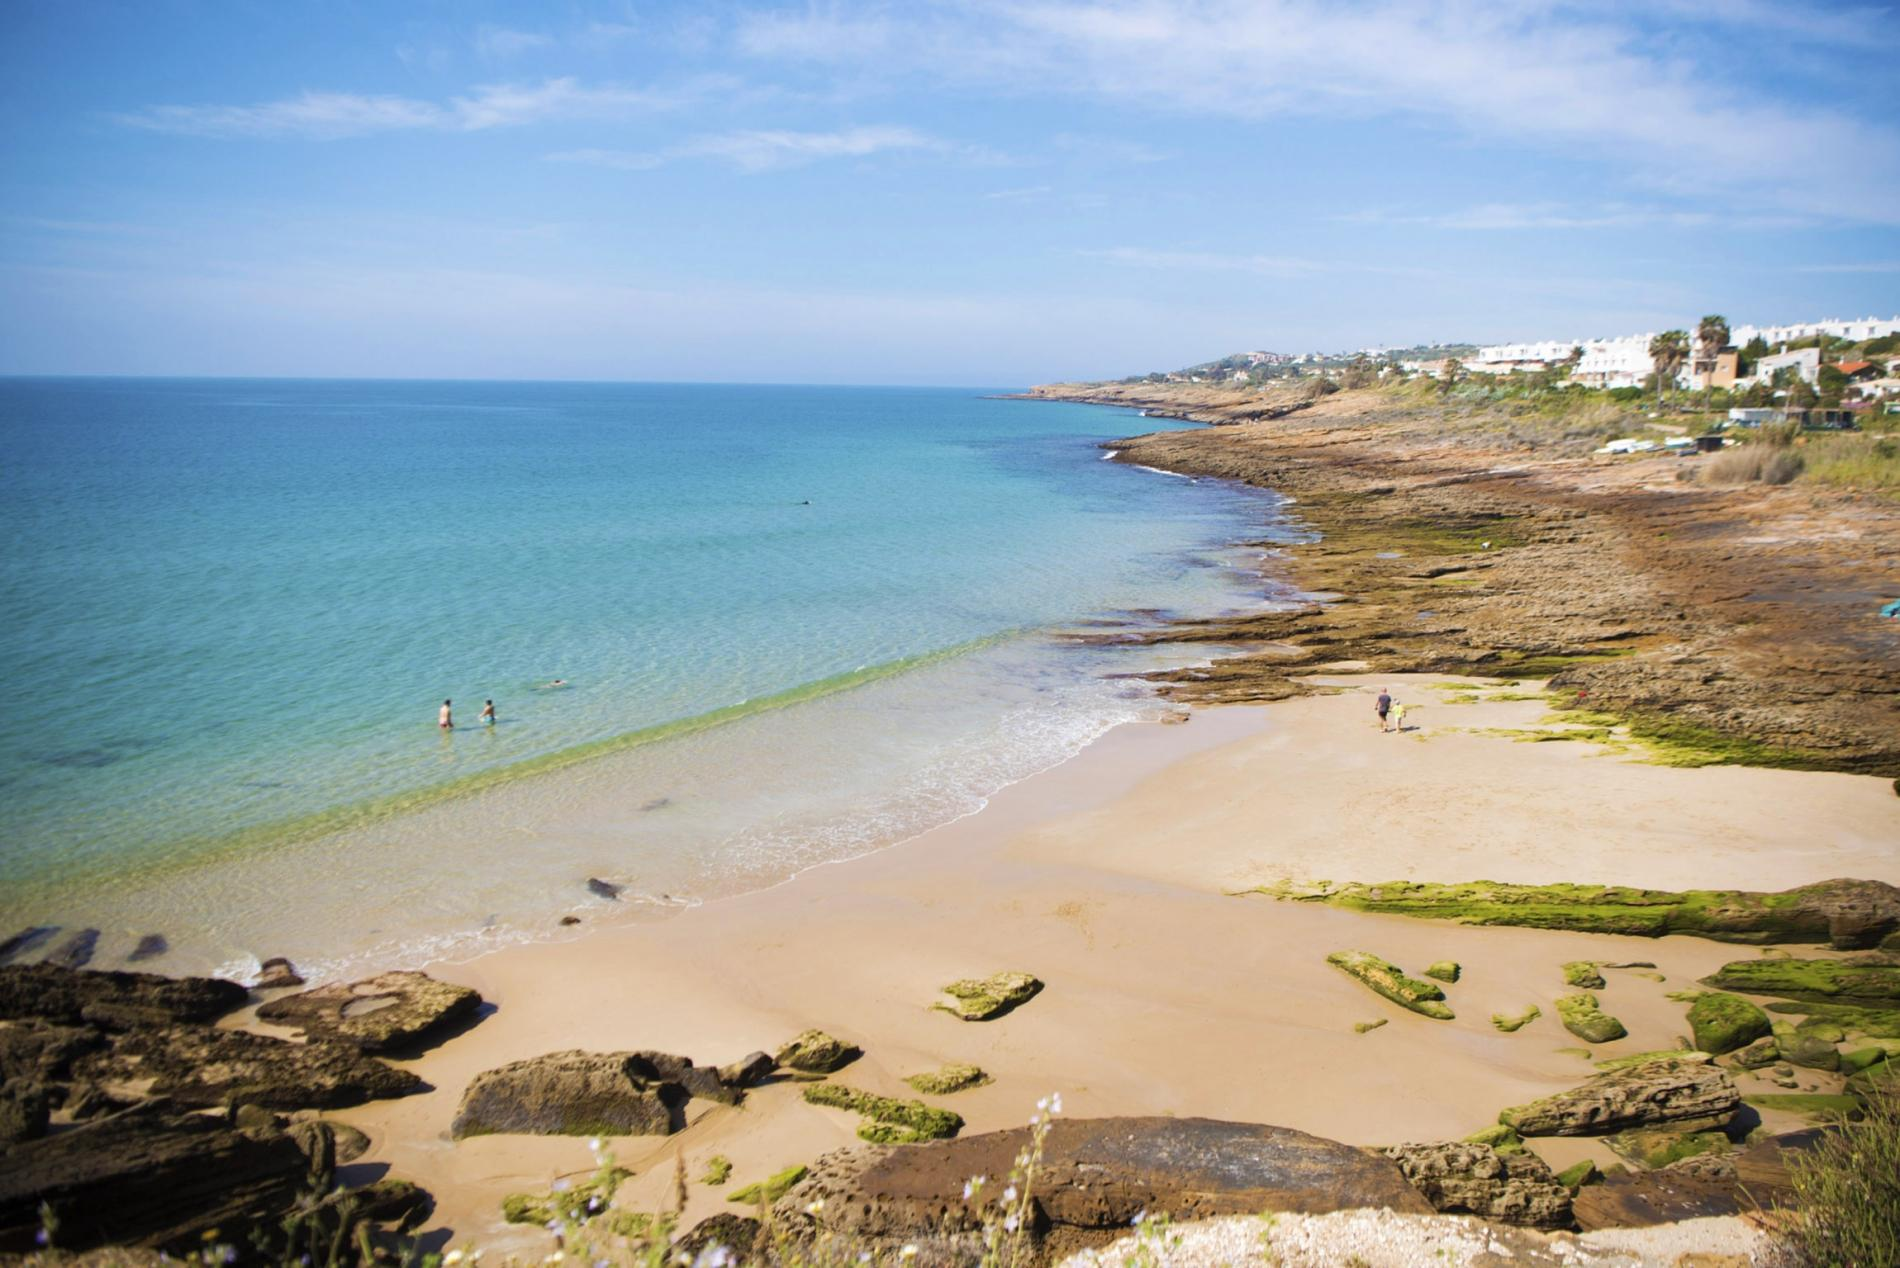 Ferienwohnung B29 - LuzBay Duplex (2558092), Luz, , Algarve, Portugal, Bild 43